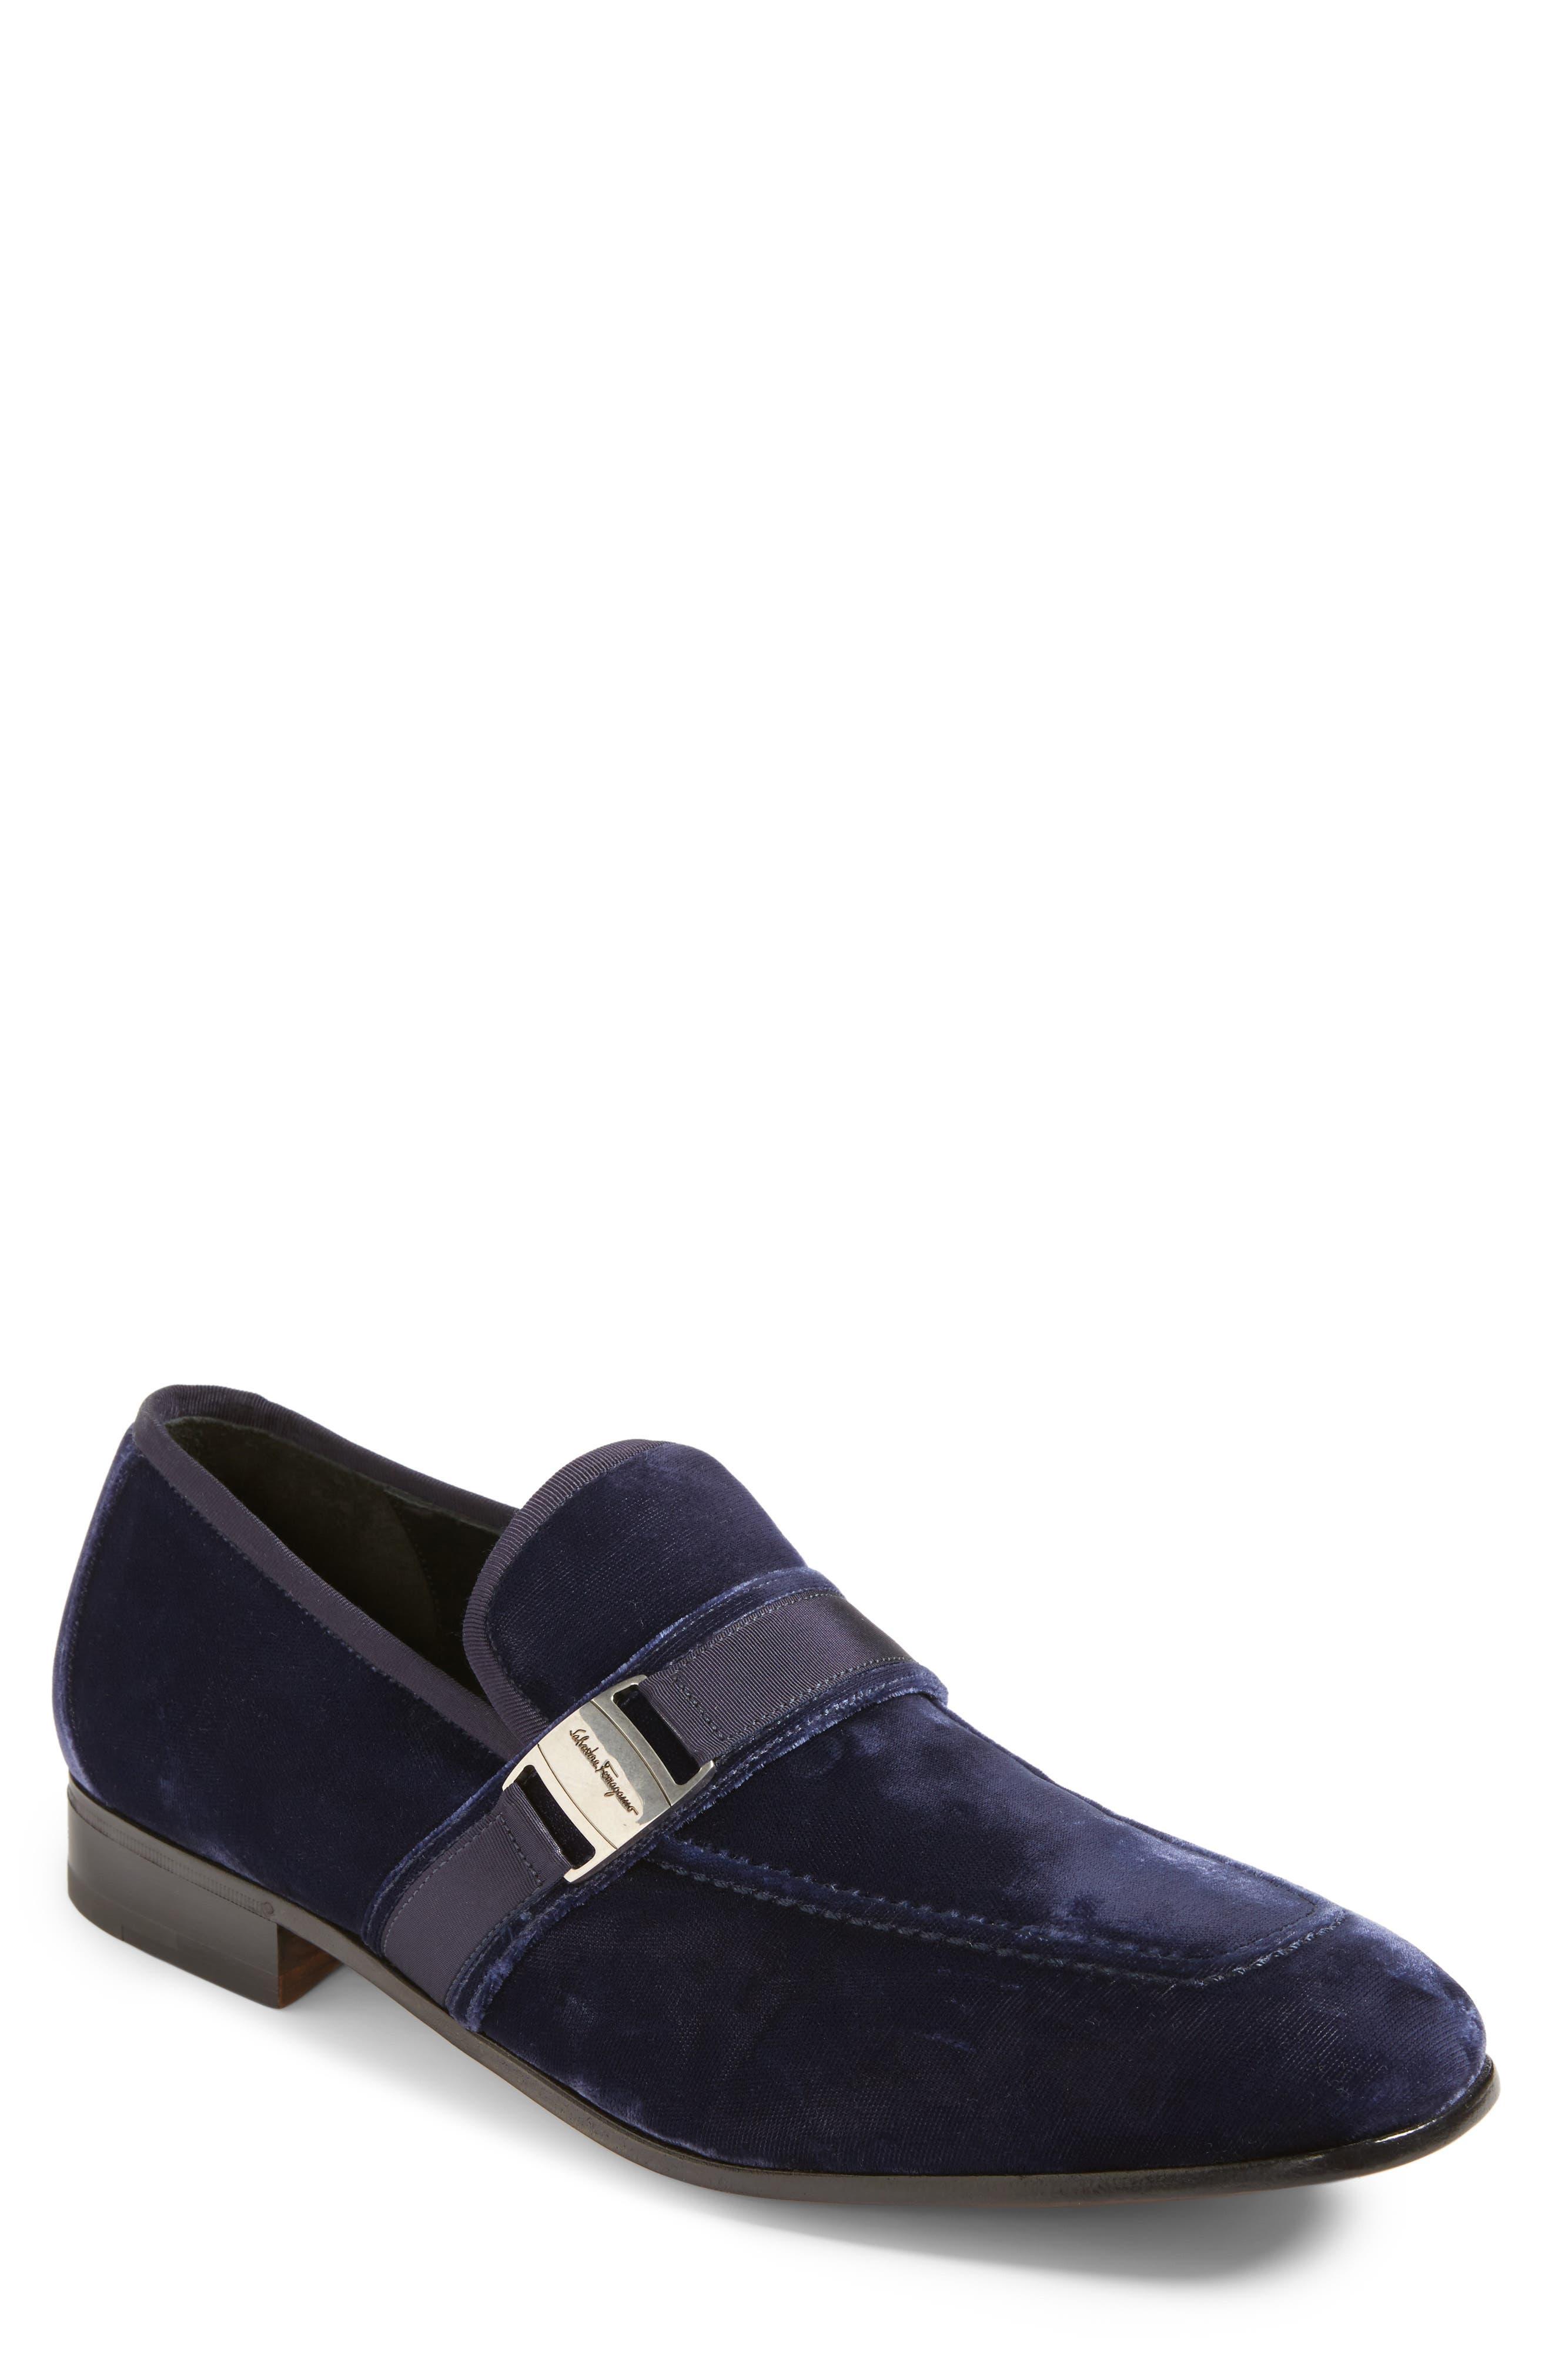 Danny 2 Bit Loafer,                         Main,                         color, Blue Marine Velvet